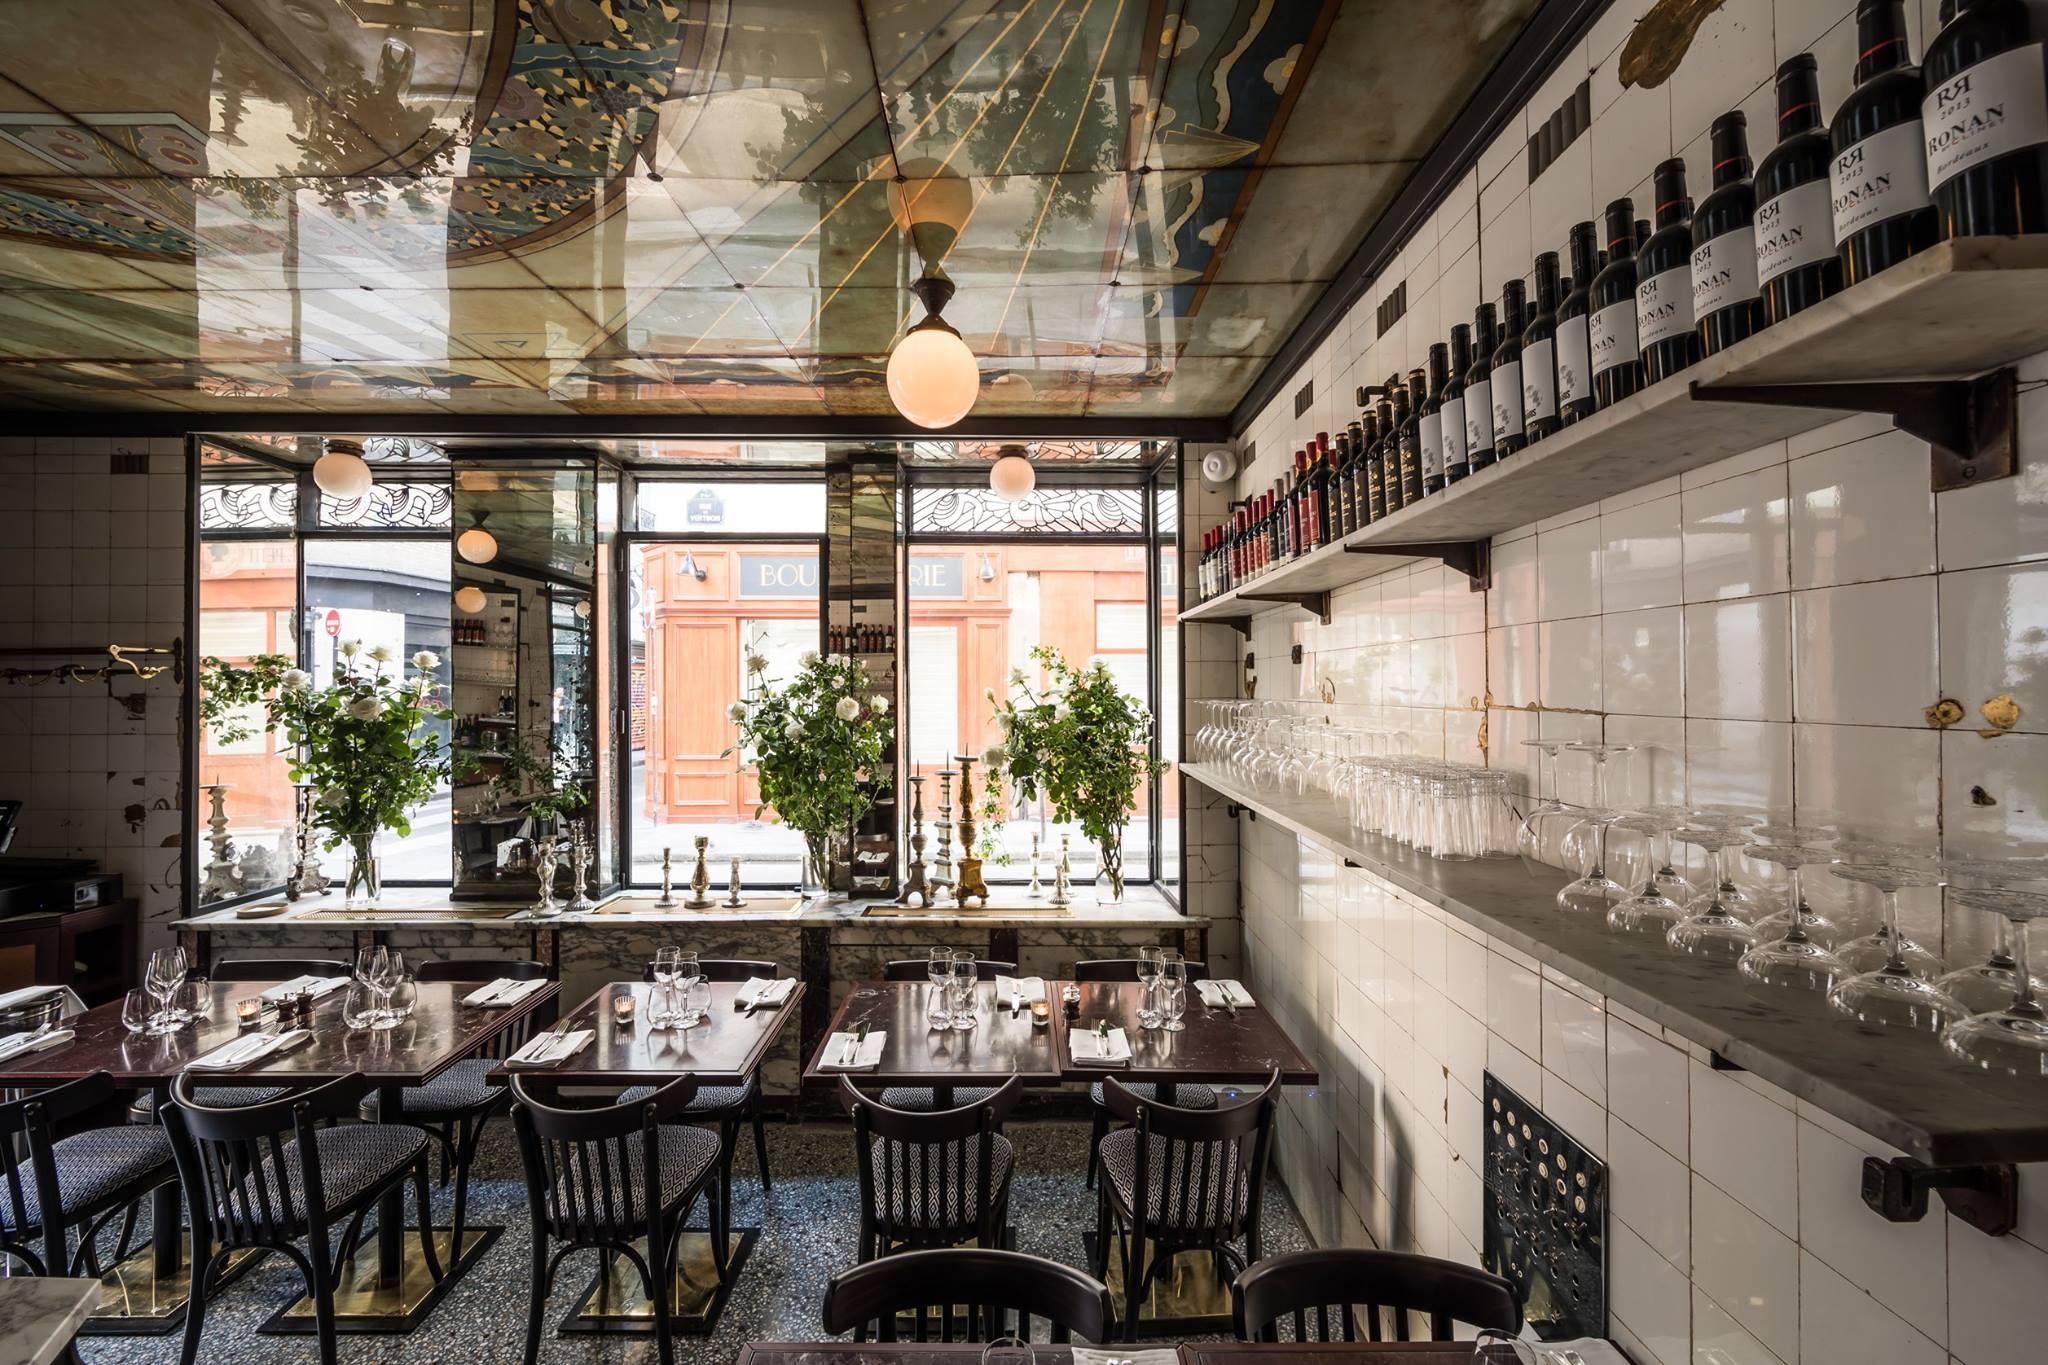 anahi restaurants 3e arrondissement paris. Black Bedroom Furniture Sets. Home Design Ideas